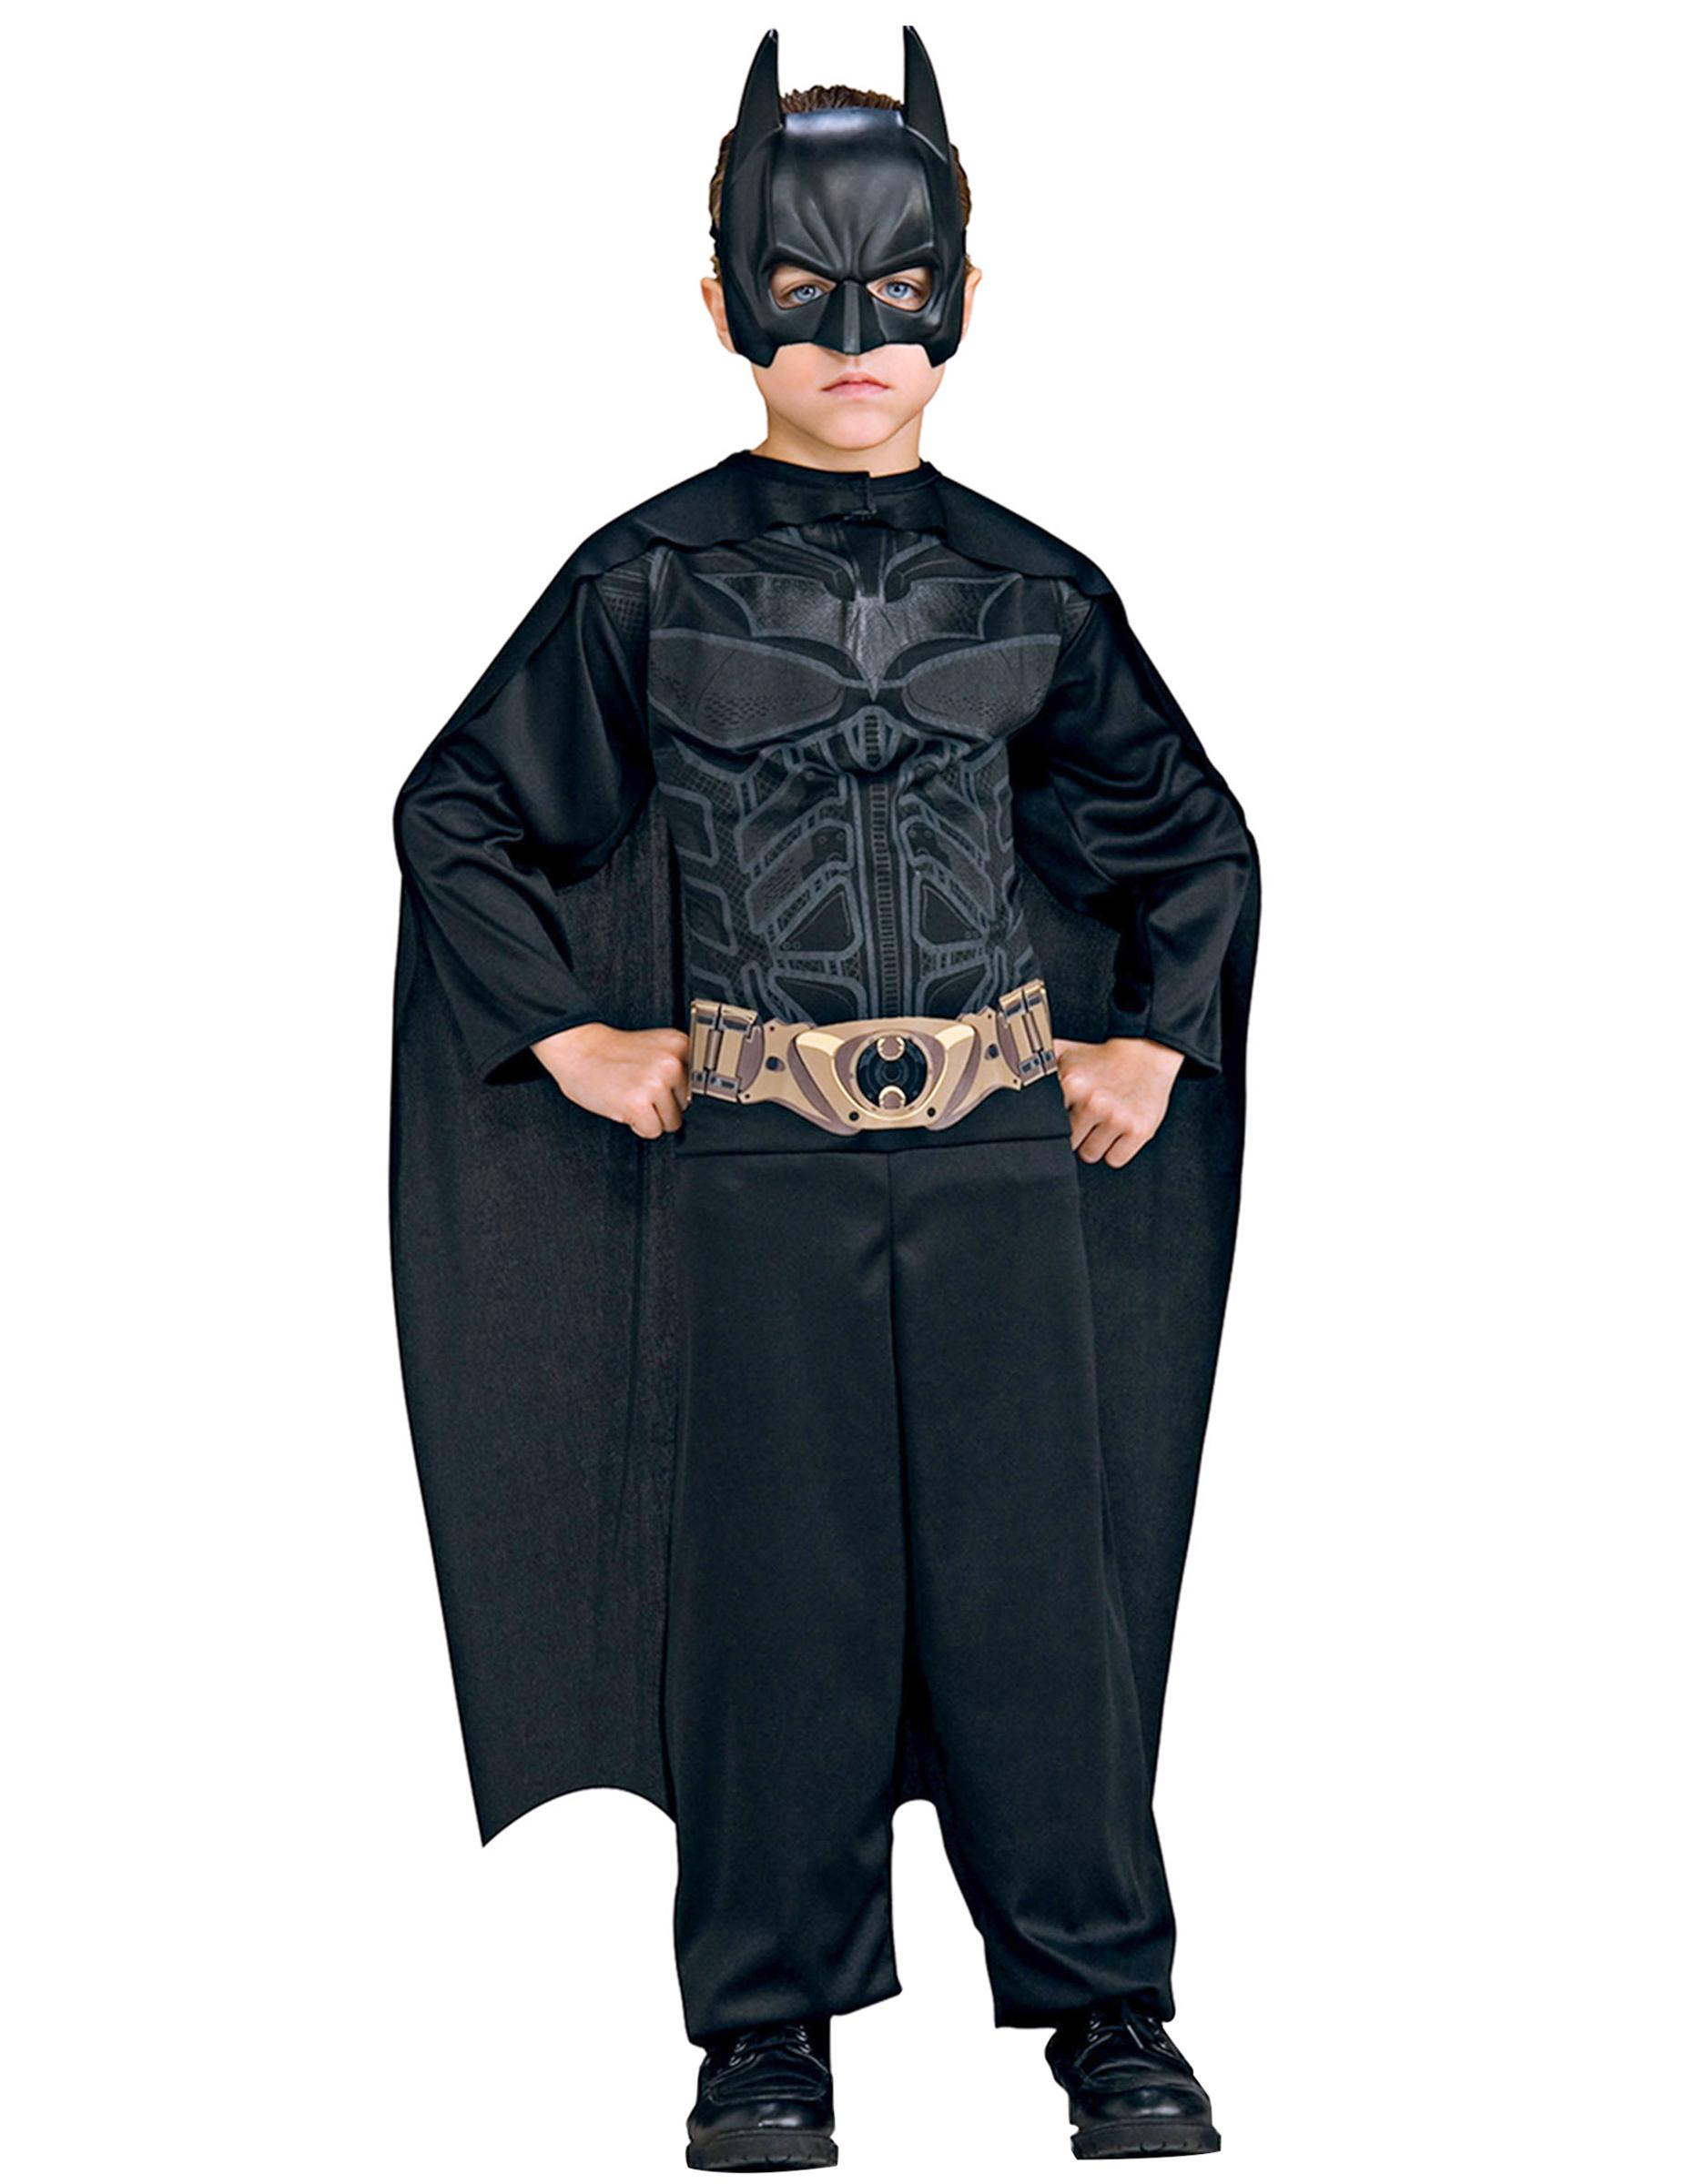 batman dark knight kost m f r jungen kost me f r kinder. Black Bedroom Furniture Sets. Home Design Ideas